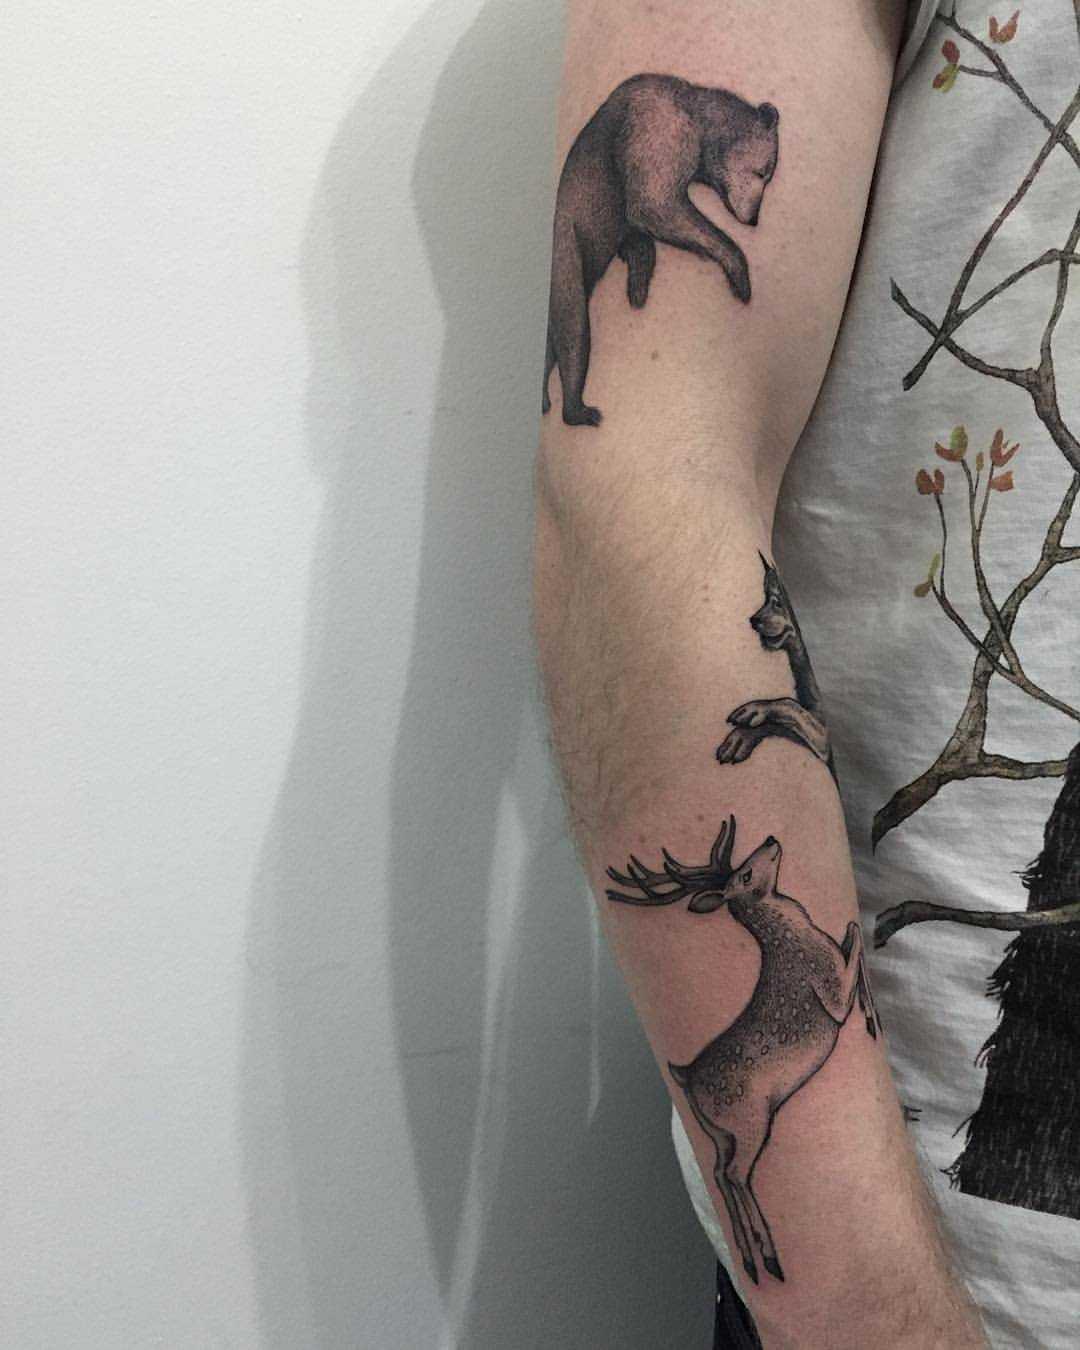 Bear, wolf, and deer tattoos